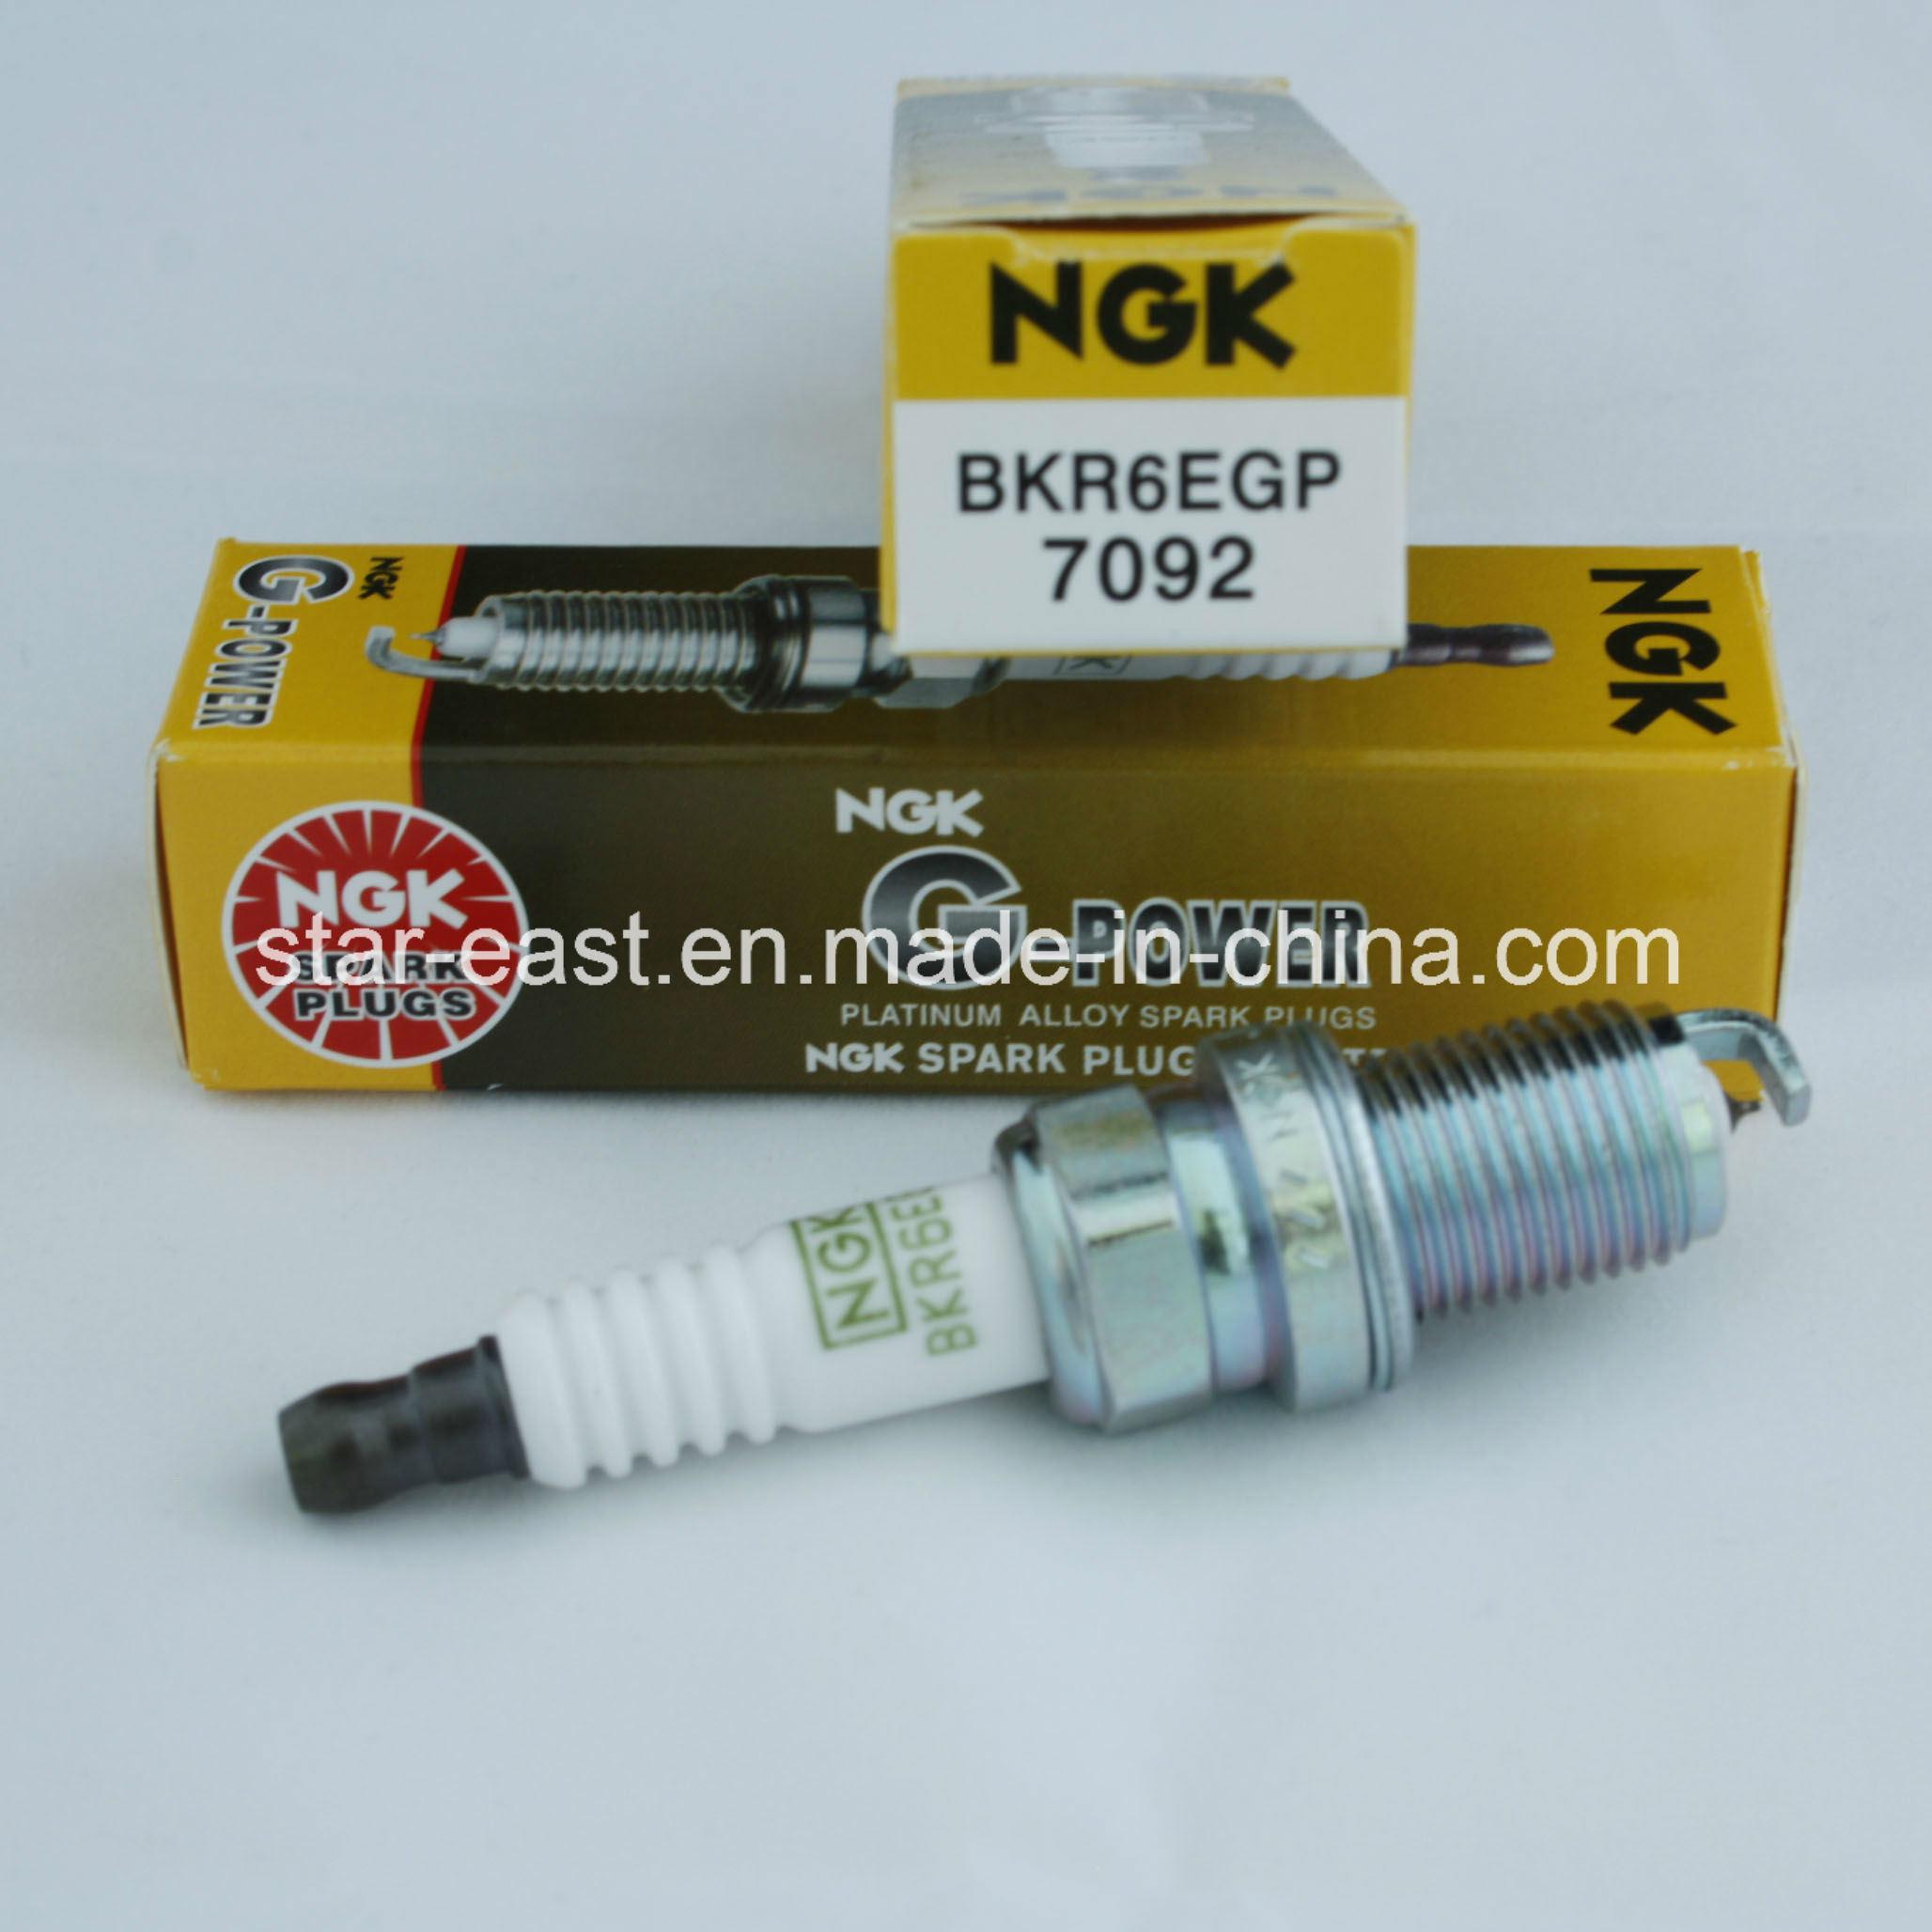 Hight Quality Spark Plug for Bkr6egp 7092 Mitsubishi/ Nissan/Toyota